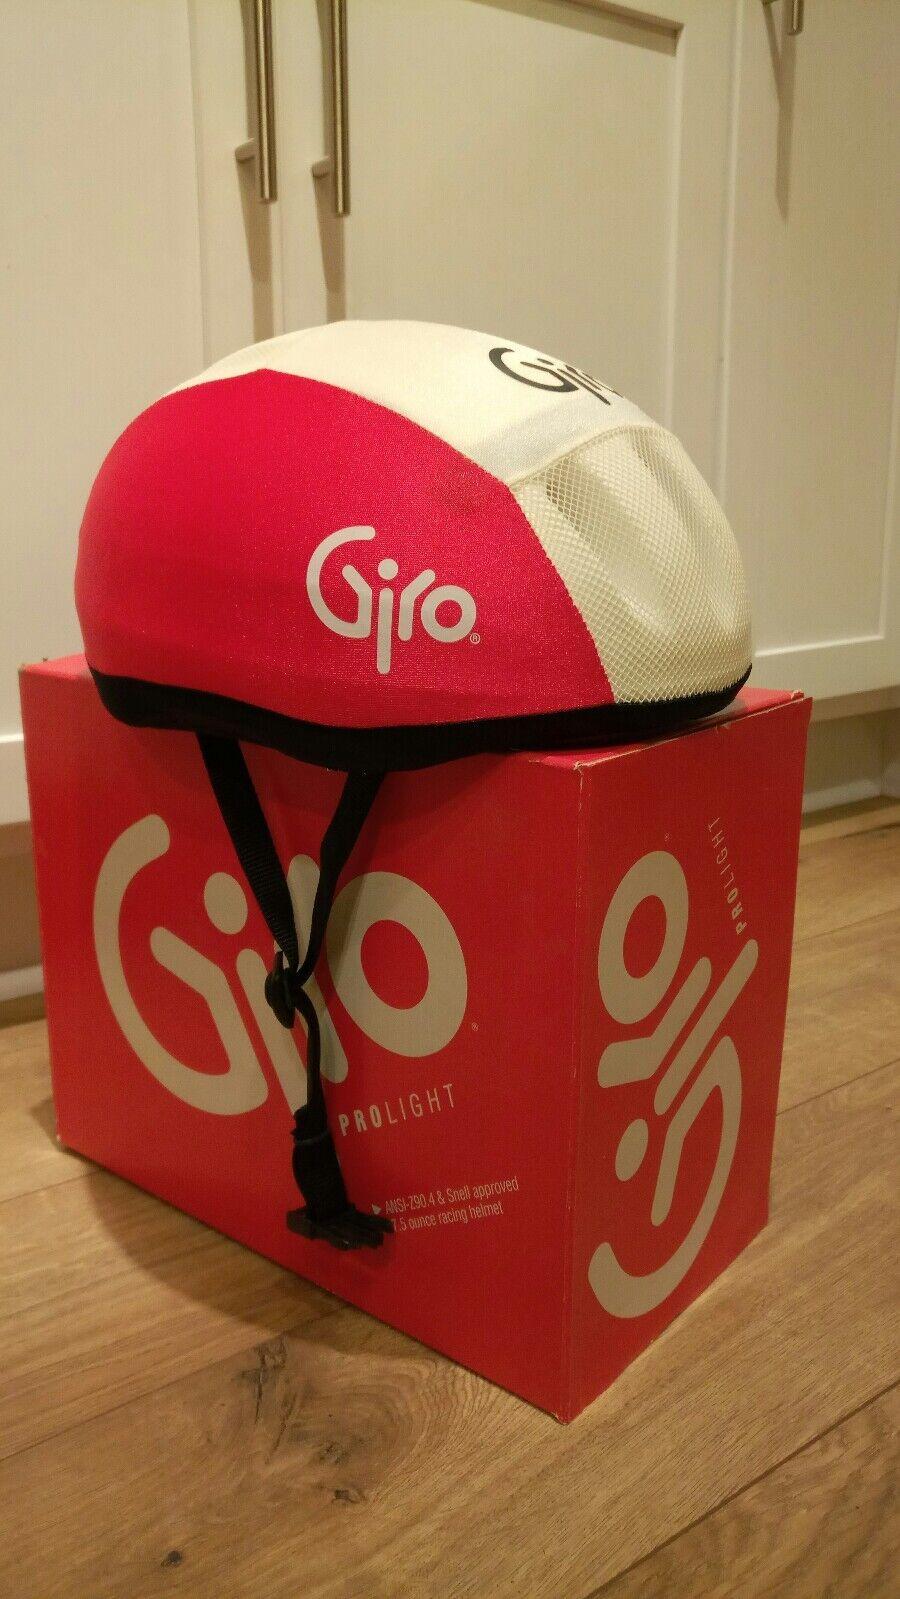 Vintage Giro Pro light 7.5 oz bicycle racing helmet Prolight medium 1985